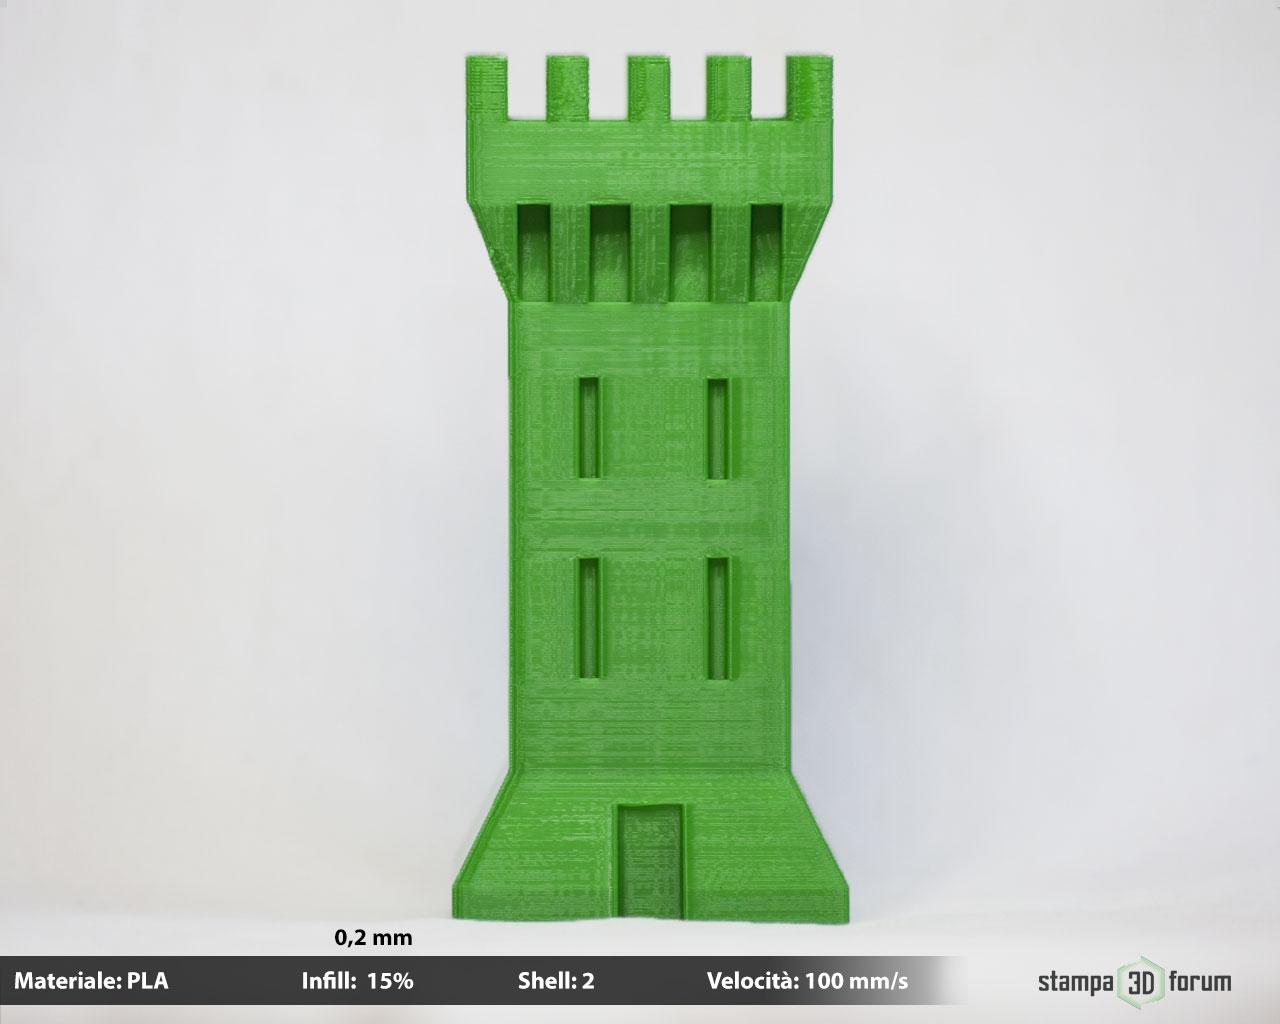 makerbot-replicator-2X-printing-test-PLA-recensione-stampa-3d-forum-11